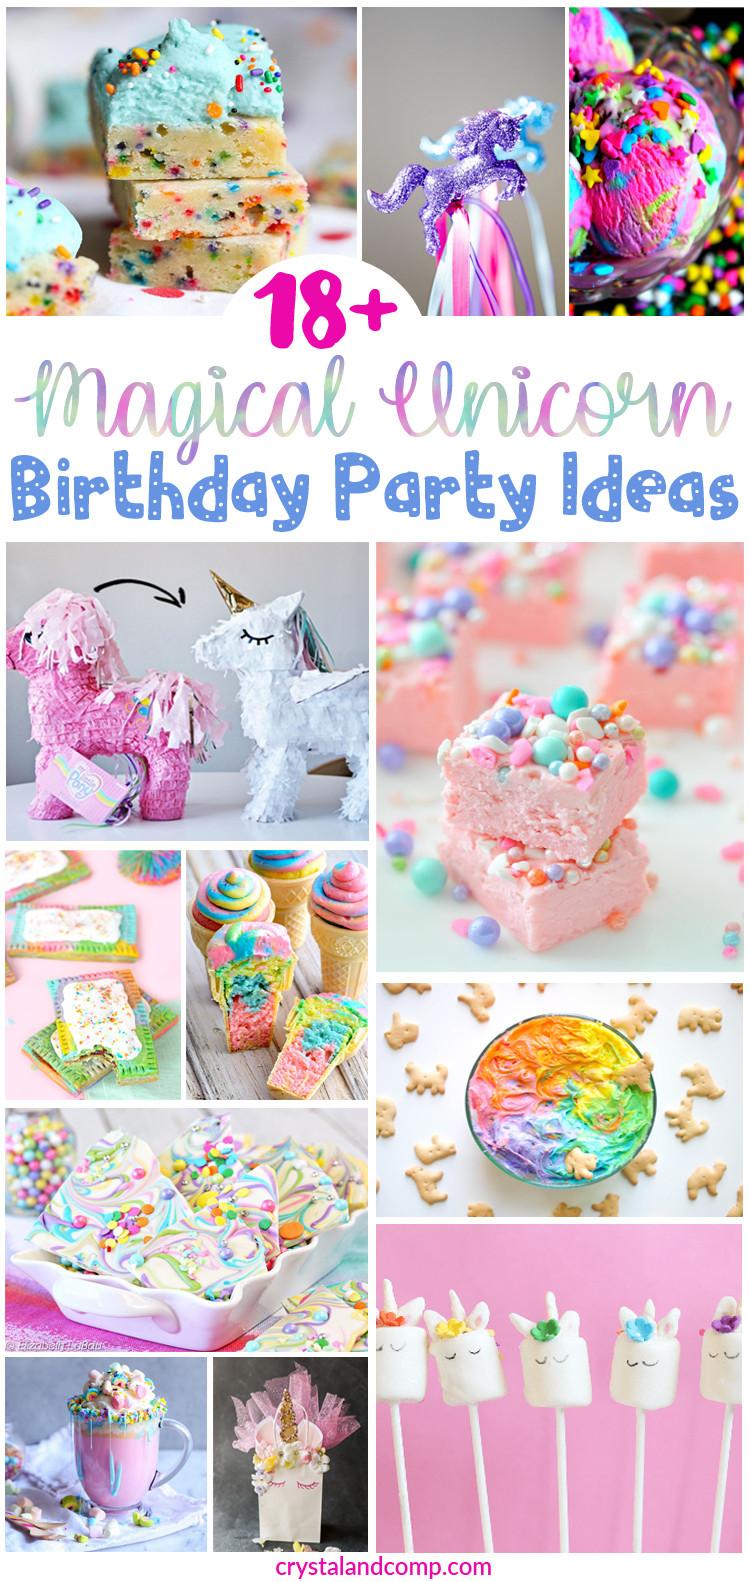 Ideas For Unicorn Party  Over 18 Magical Unicorn Birthday Party Ideas